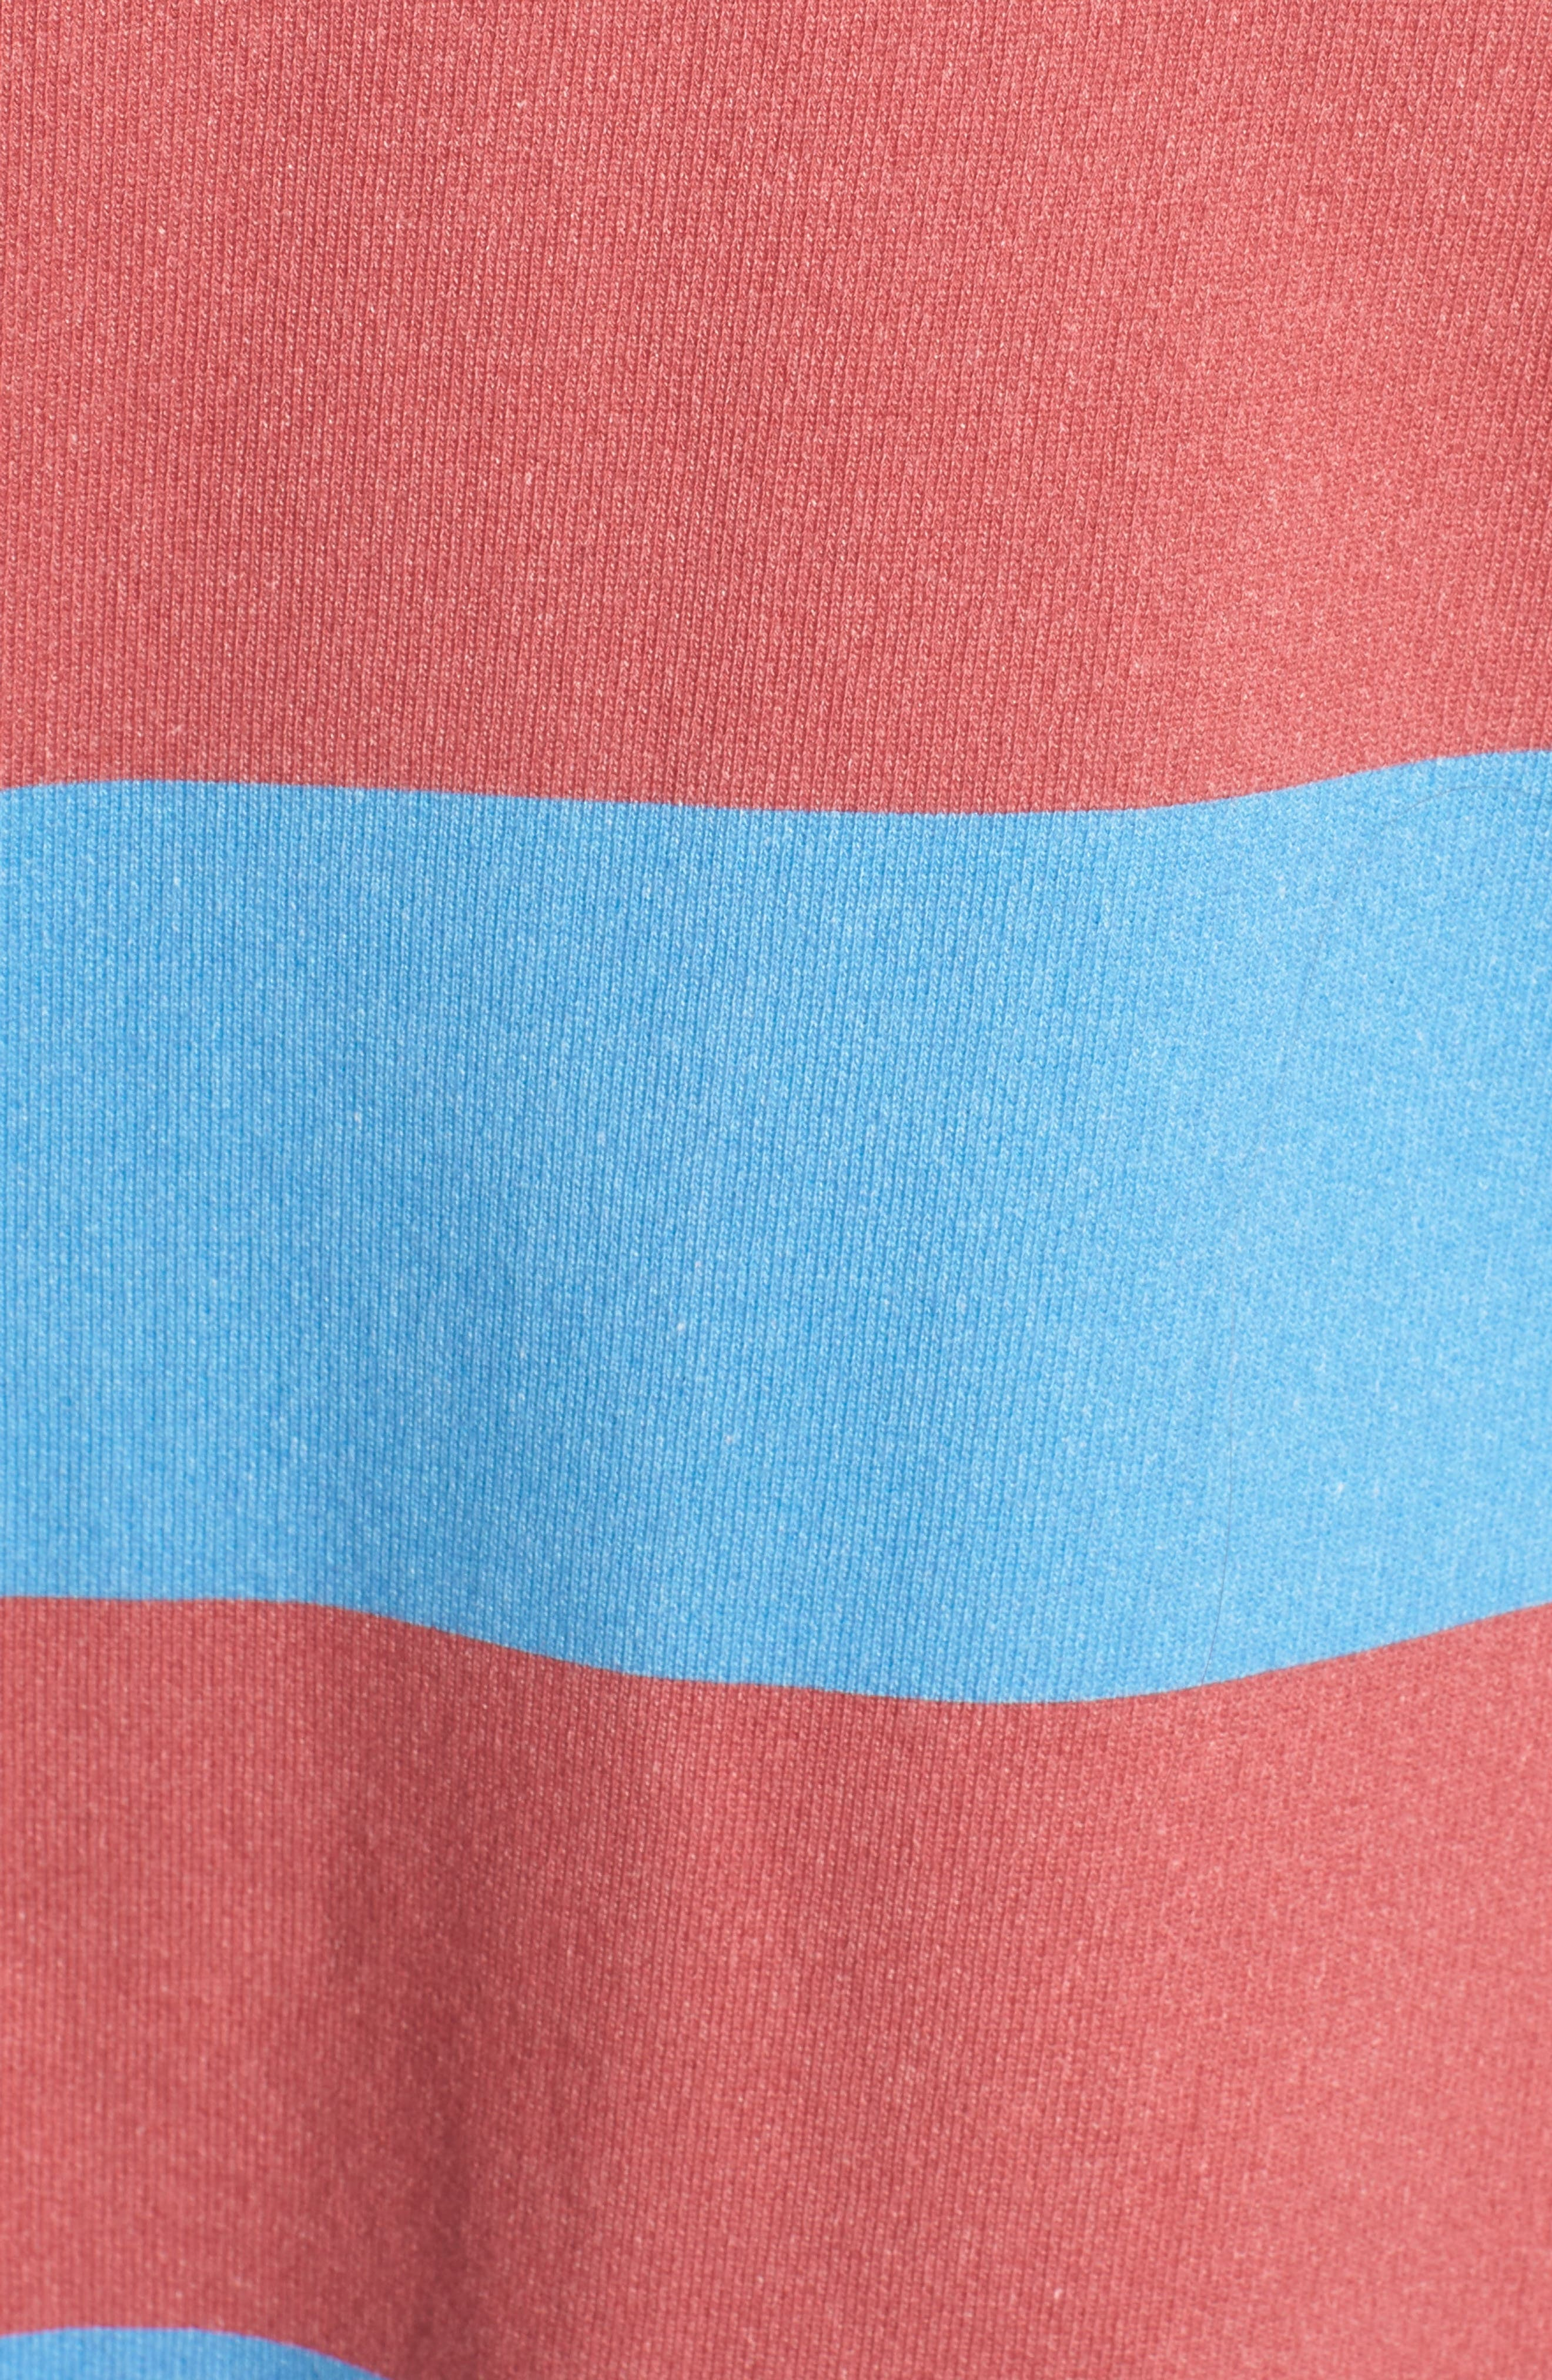 Stripe Crewneck Sweatshirt,                             Alternate thumbnail 6, color,                             Red Rugby 5 Vintage Year Wash